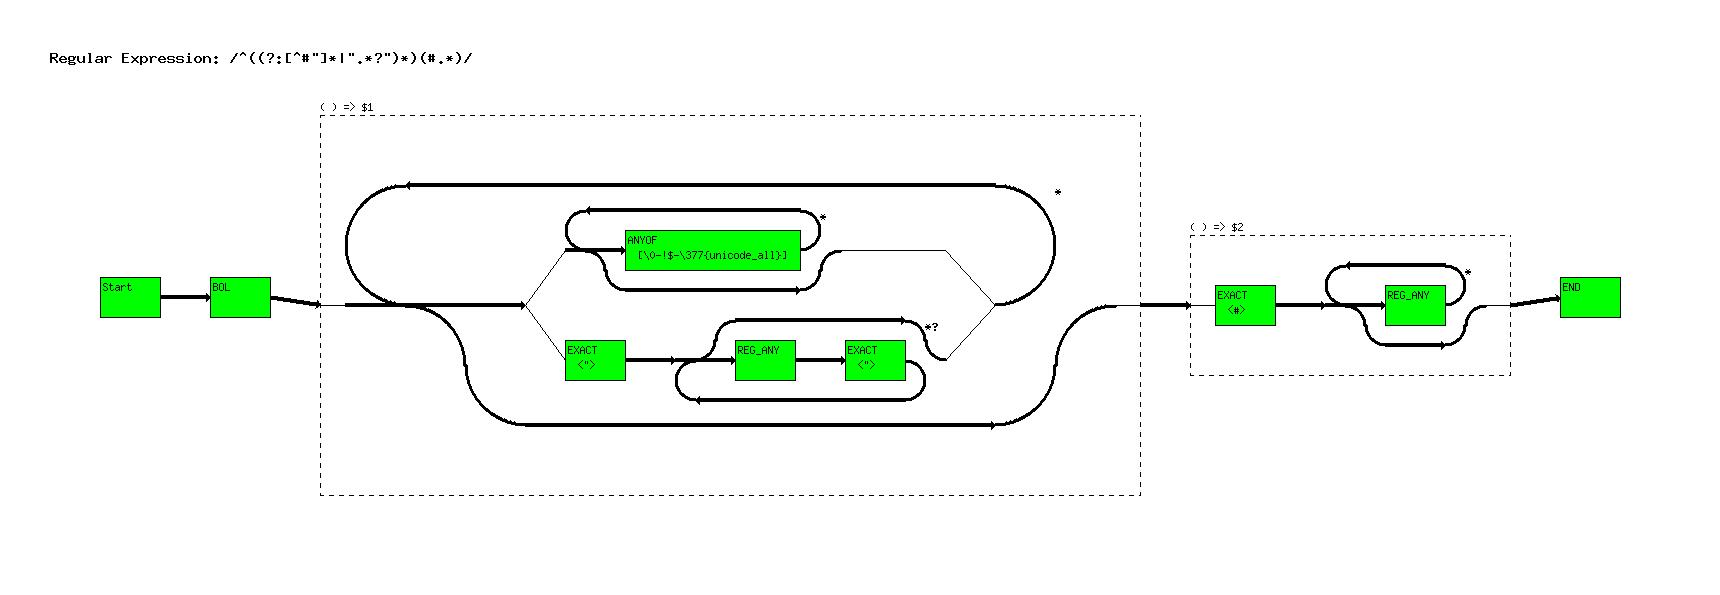 re_graph pl - Graph regular expression